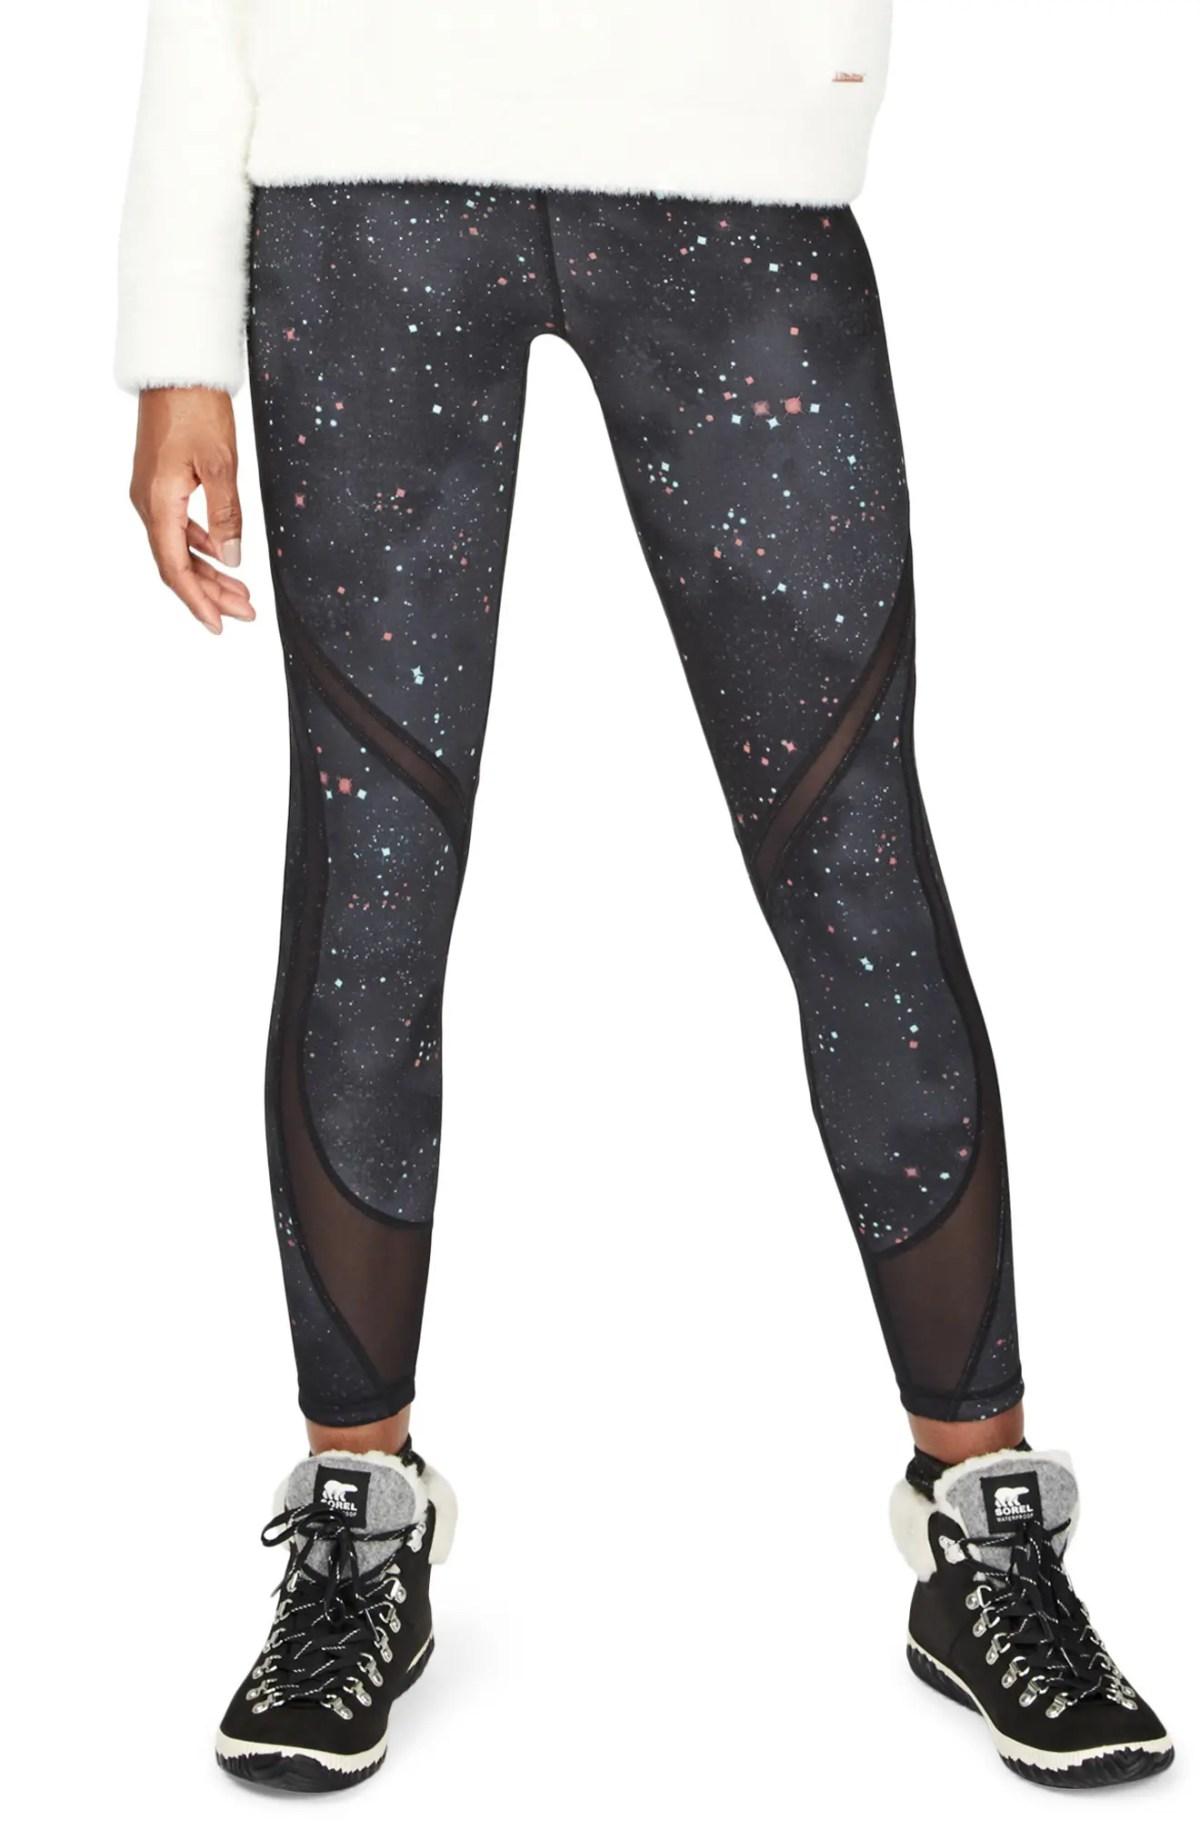 SWEATY BETTY Reversible Mesh Yoga Leggings, Main, color, SPACE RACE DITSY STAR PRINT